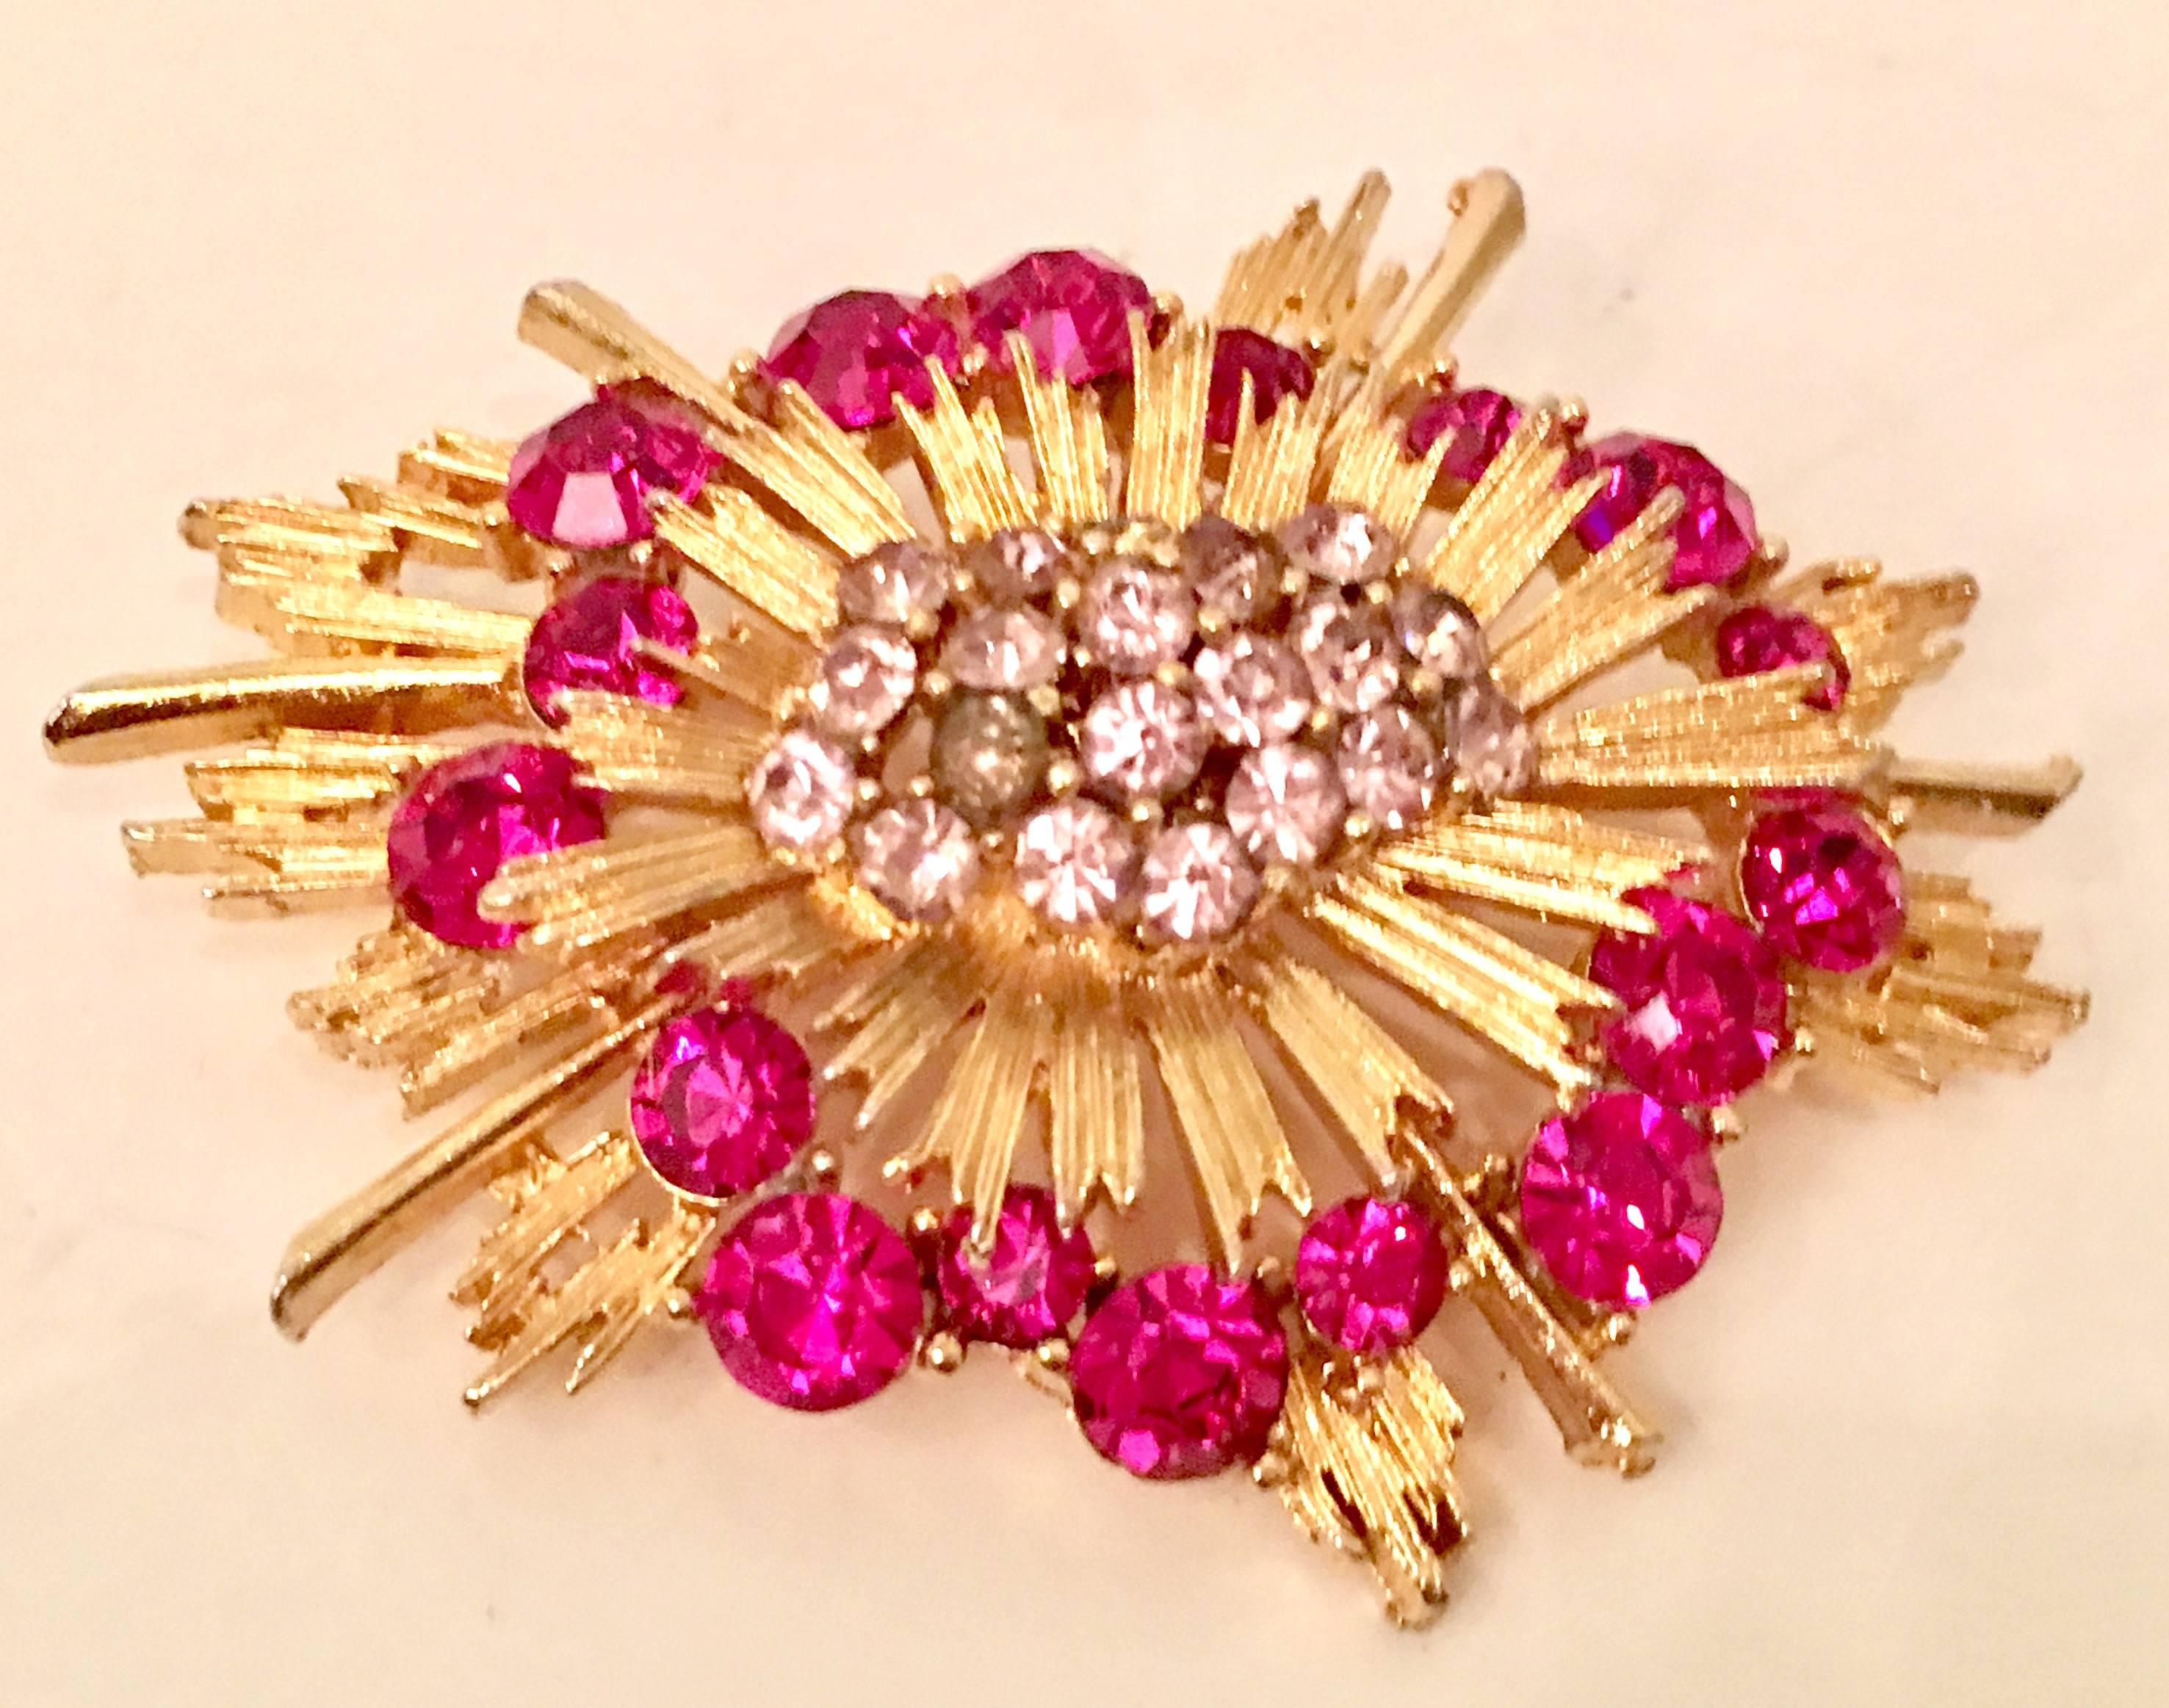 VIntage Gold and Pink Sapphite Austrian Crystal Starburst Brooch For Sale  at 1stdibs 03be4dbbdba8